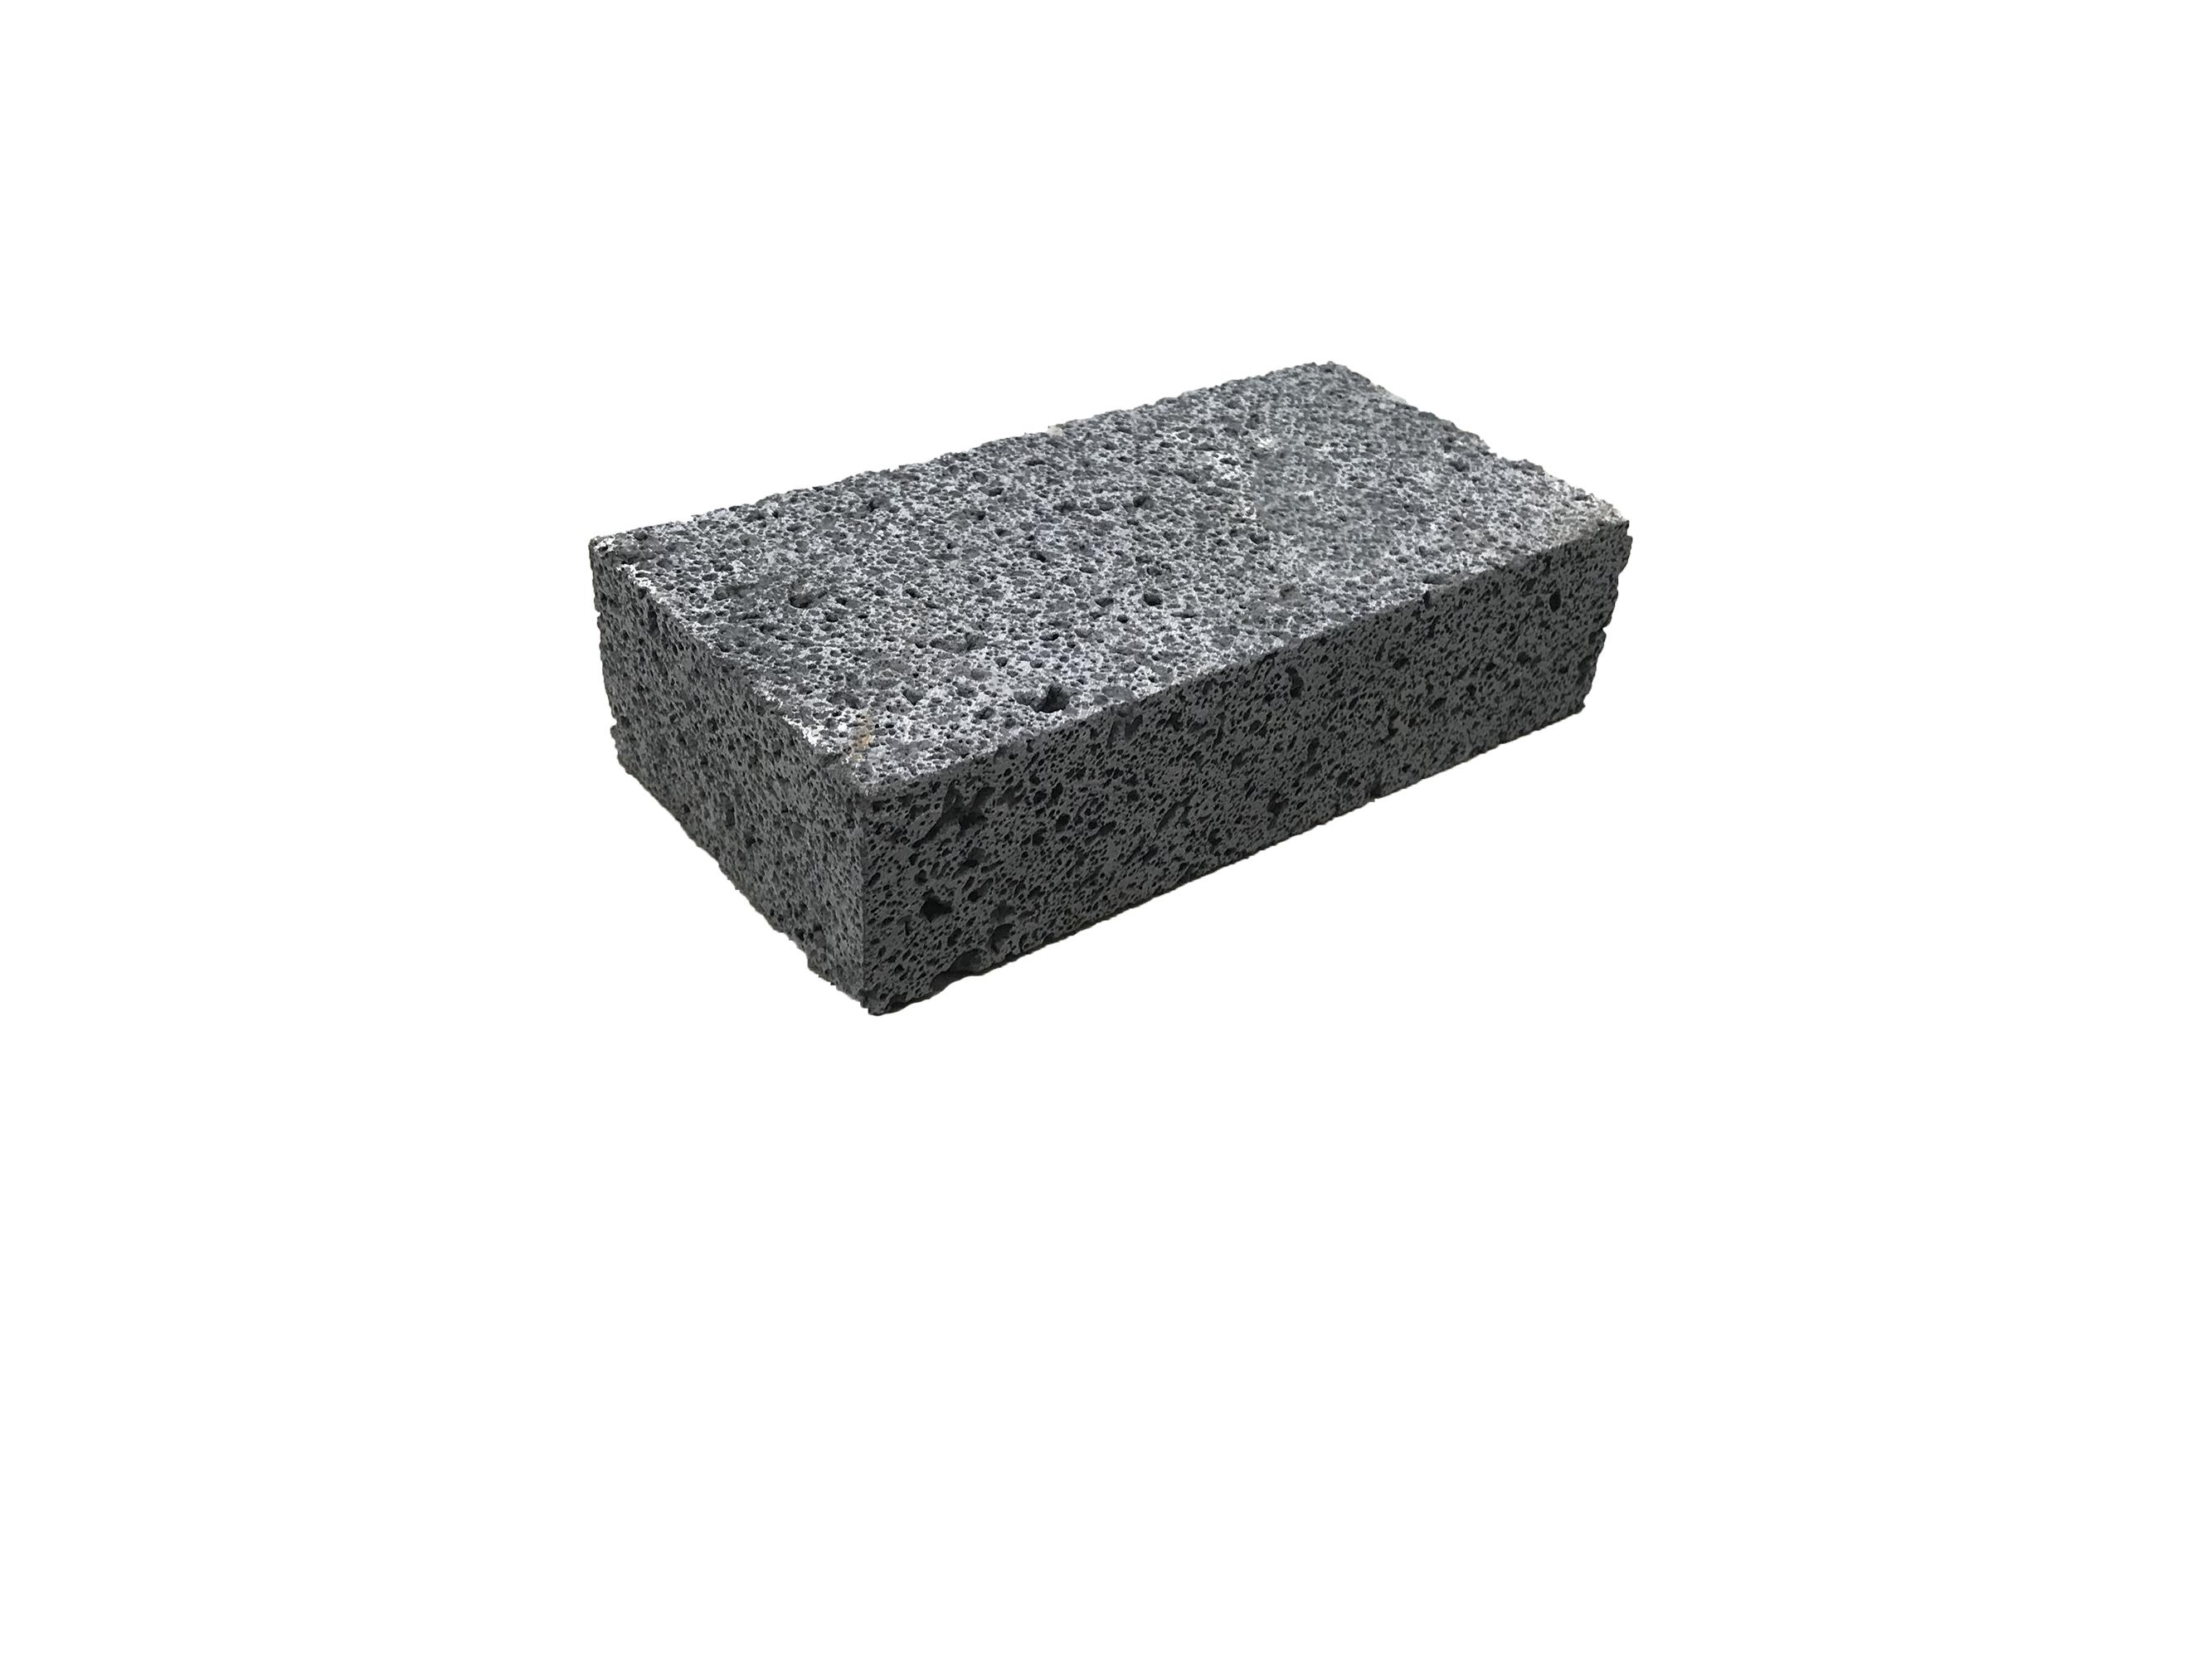 Lava Stone Paver